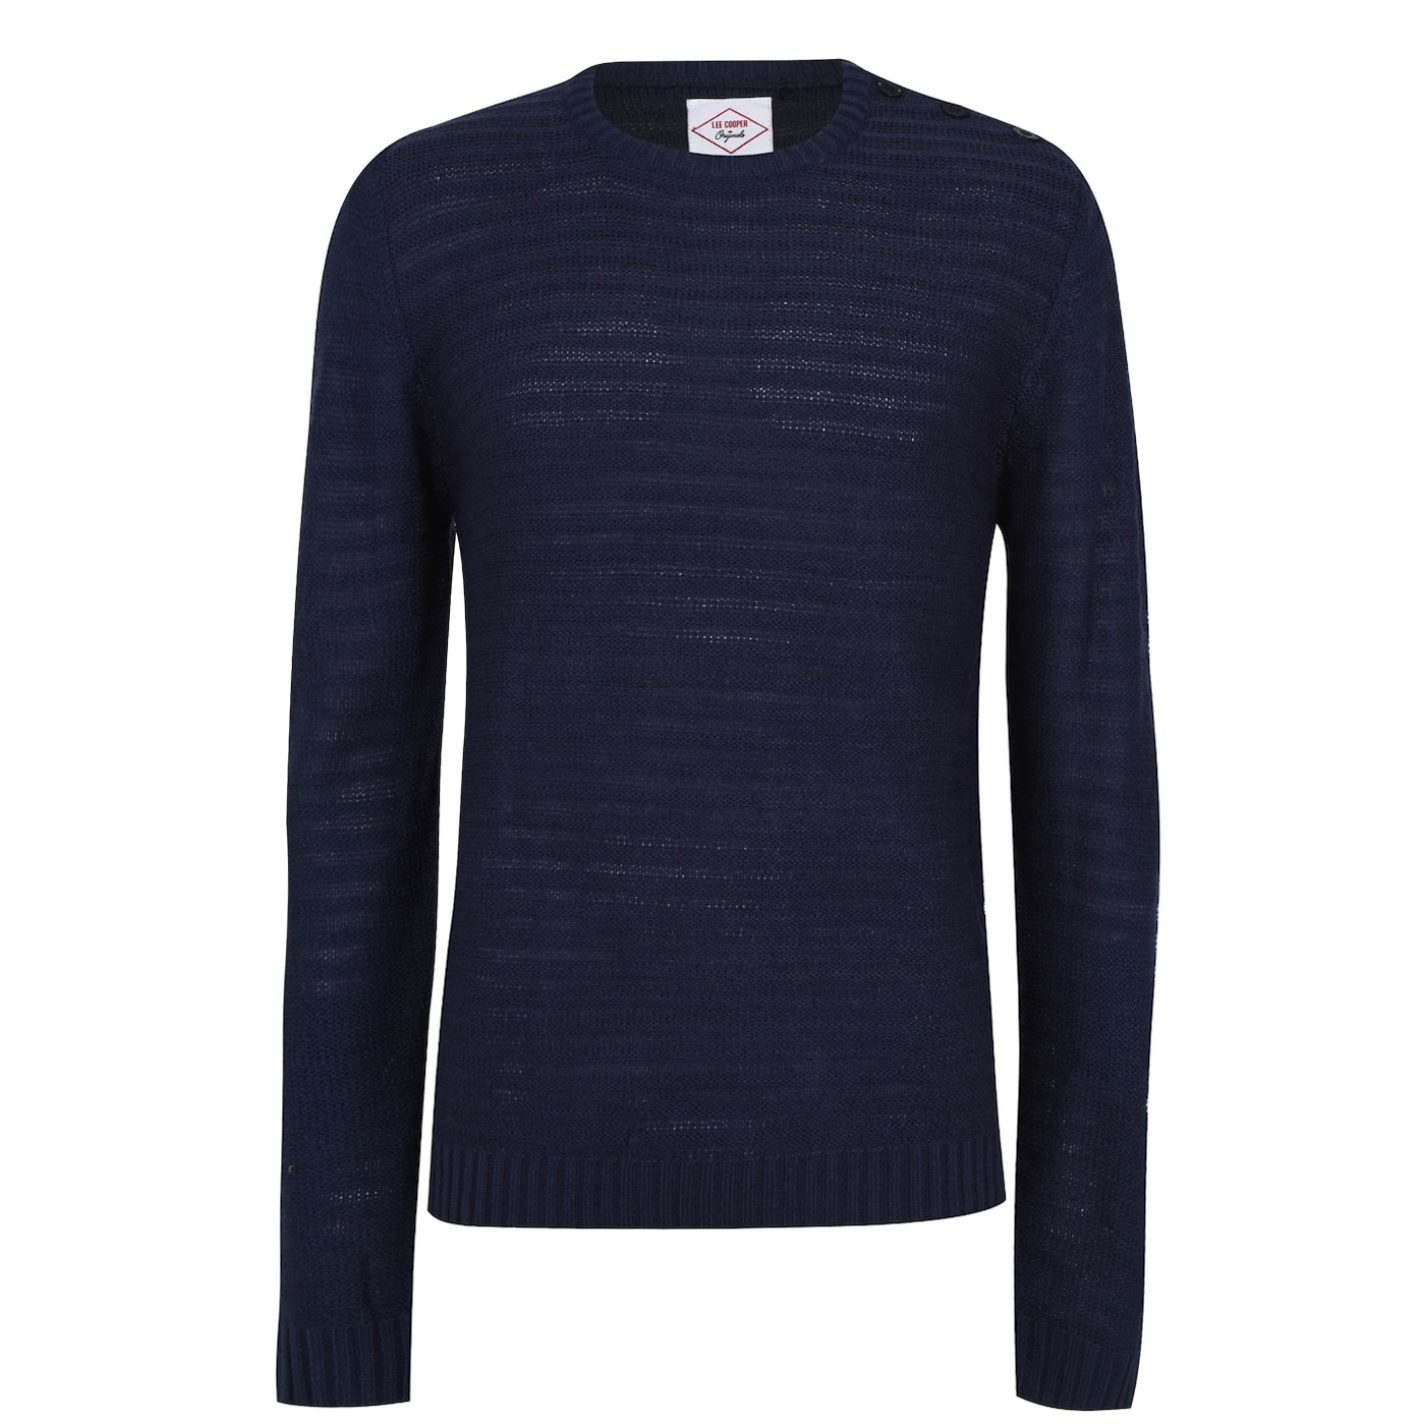 Pánsky sveter Lee Cooper Knitted